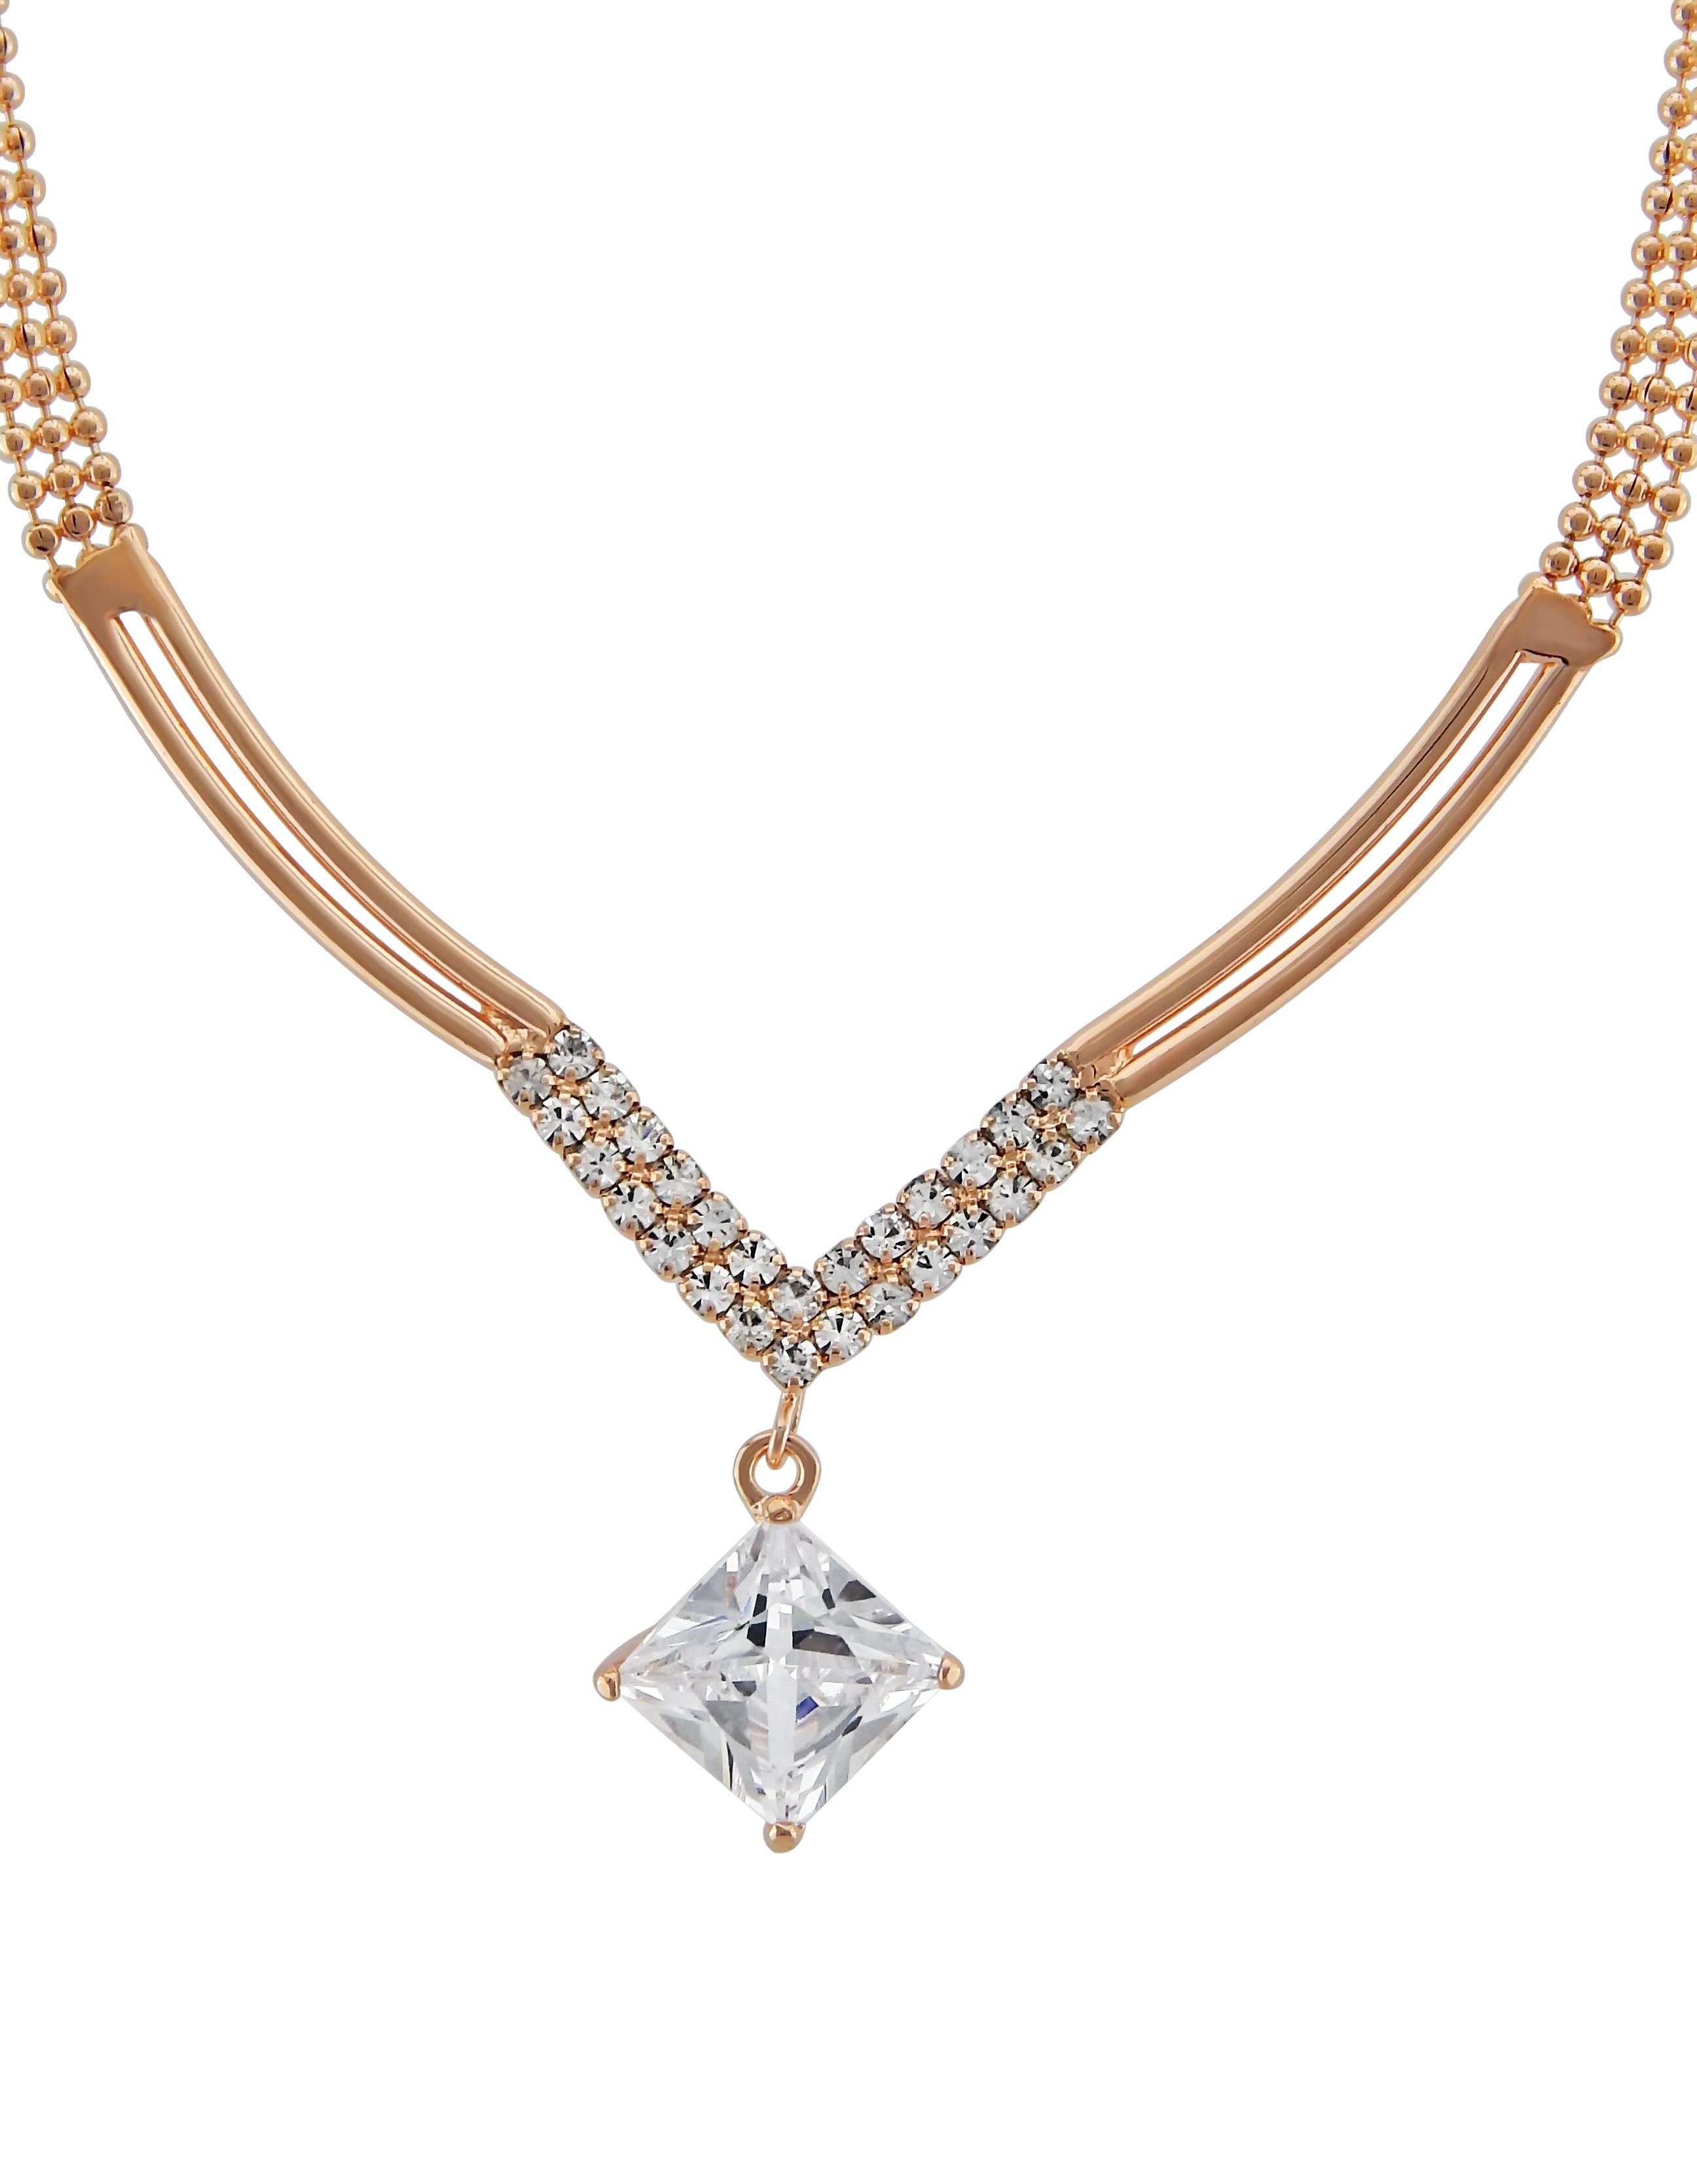 damen schmuck hals kette rose gold vergoldet kristall strass stein geschenk edel ebay. Black Bedroom Furniture Sets. Home Design Ideas